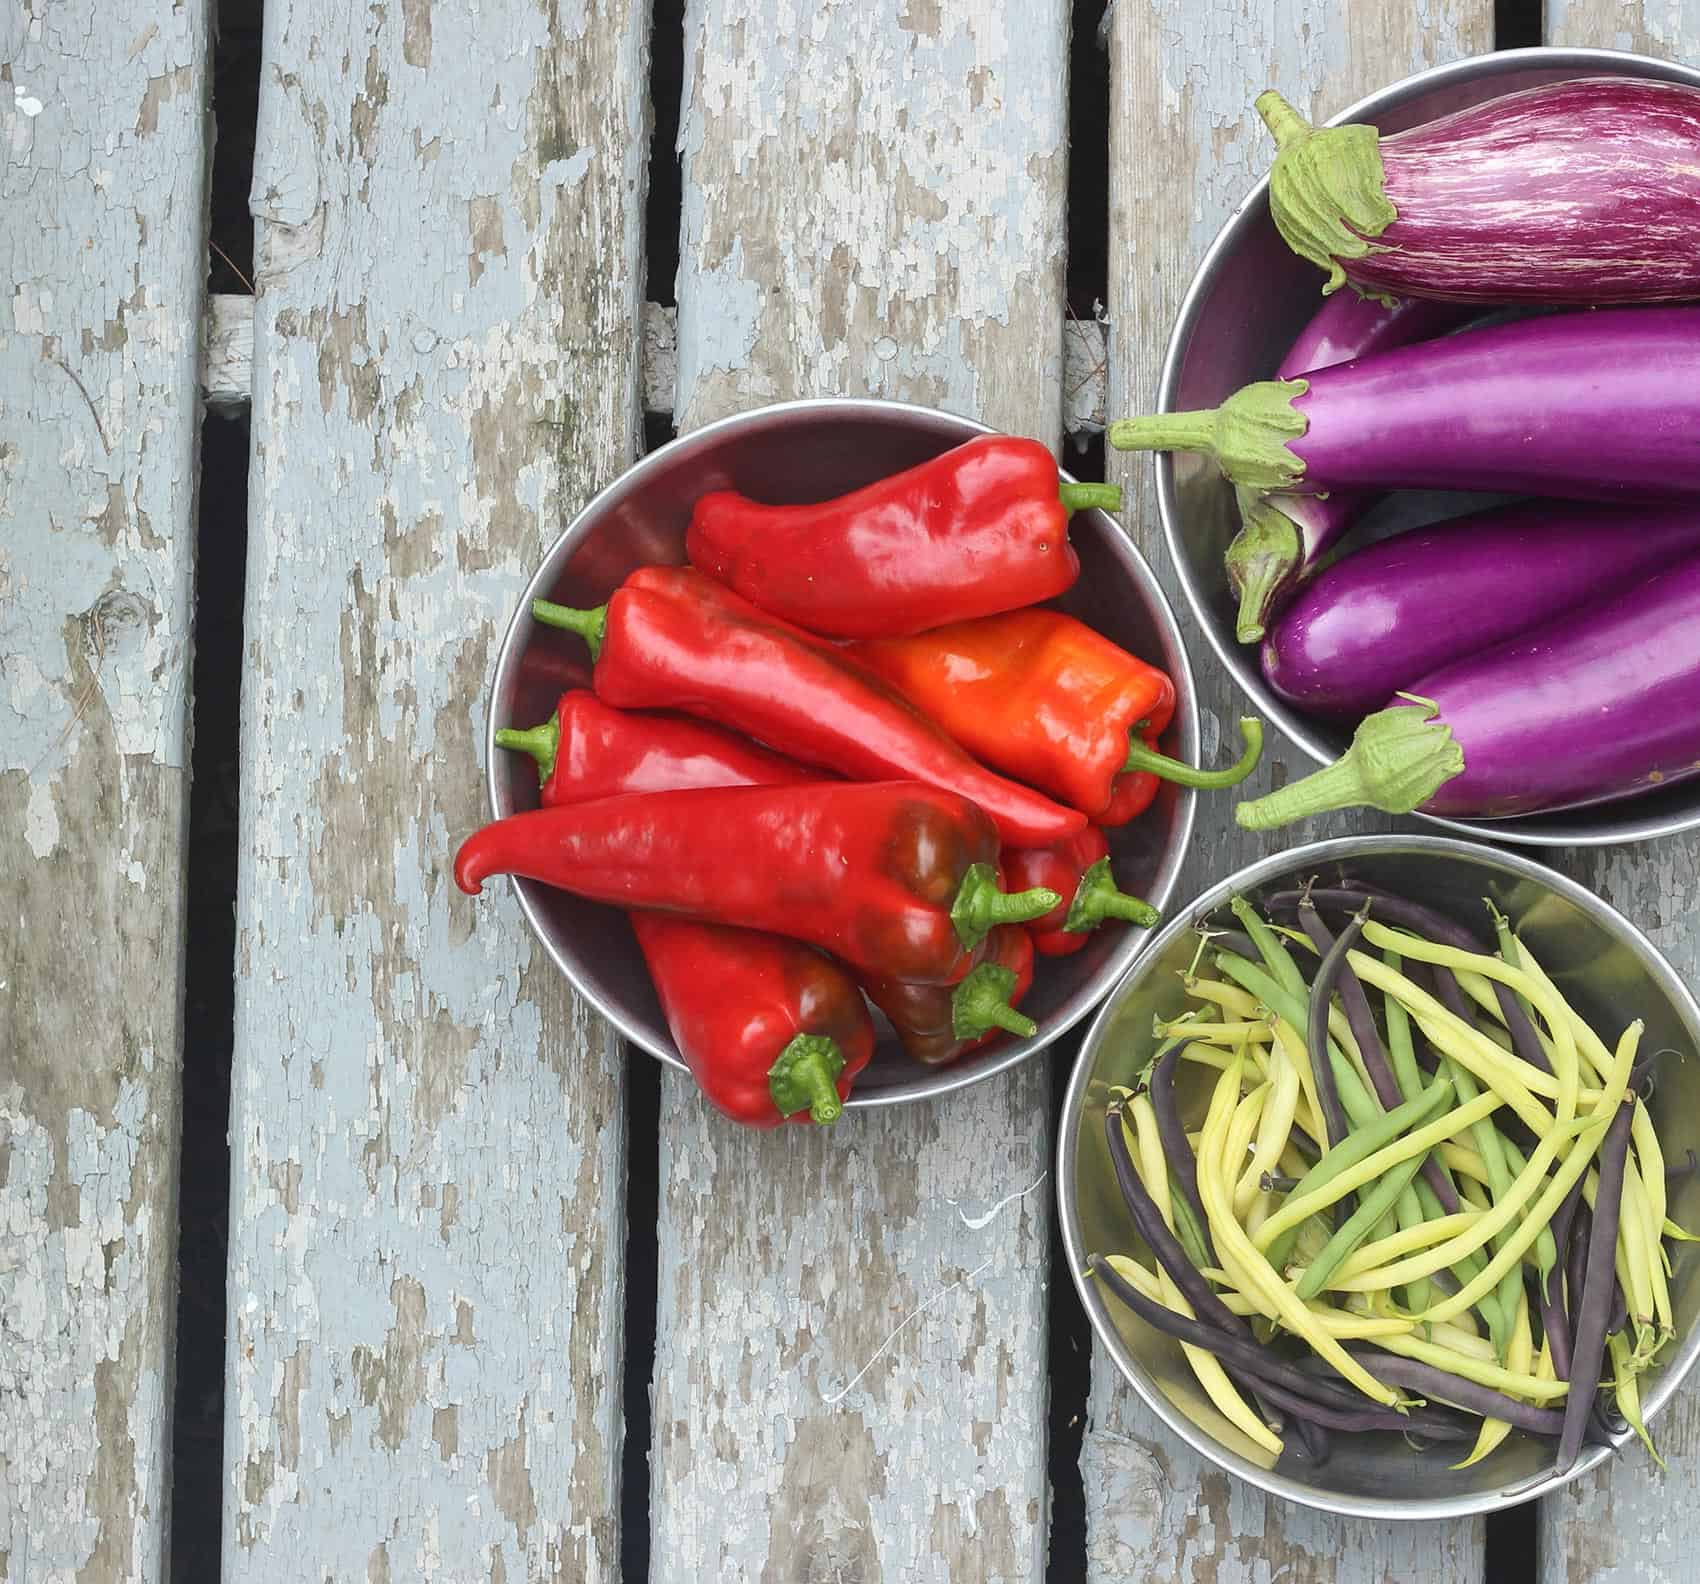 Creative Vegetable Gardener Flavorful Life Garden Club